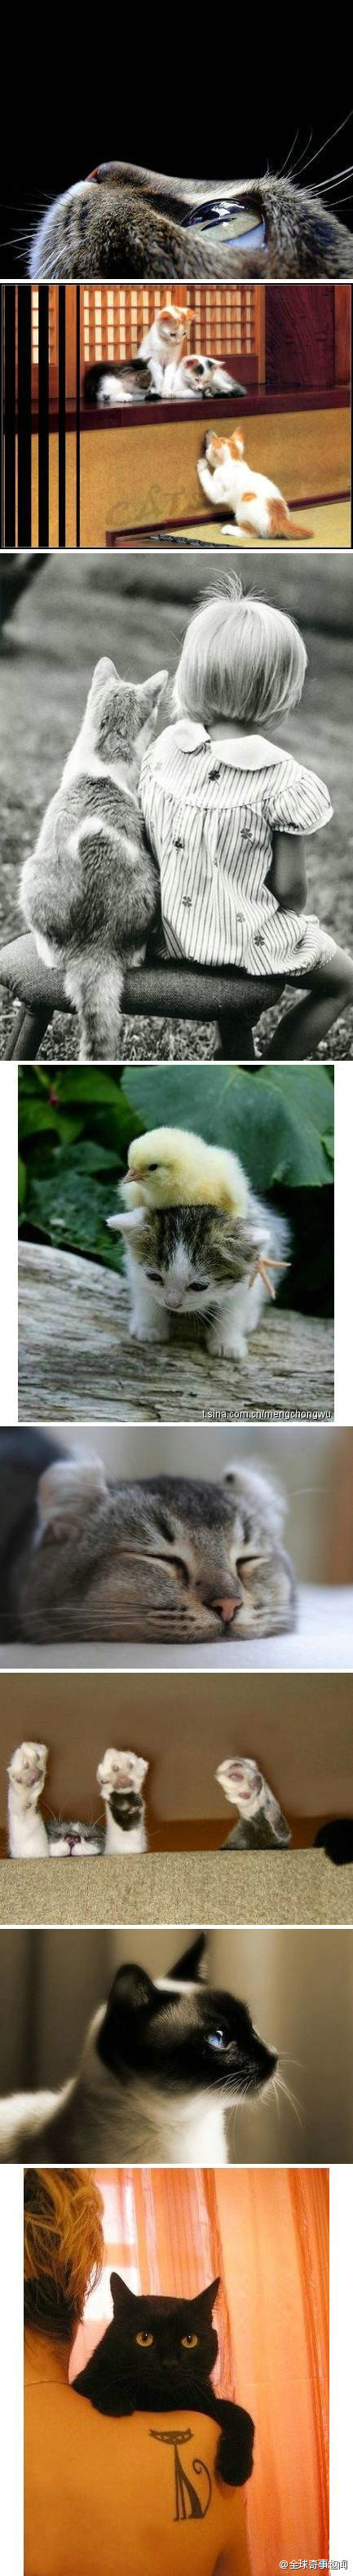 kittiessssssss